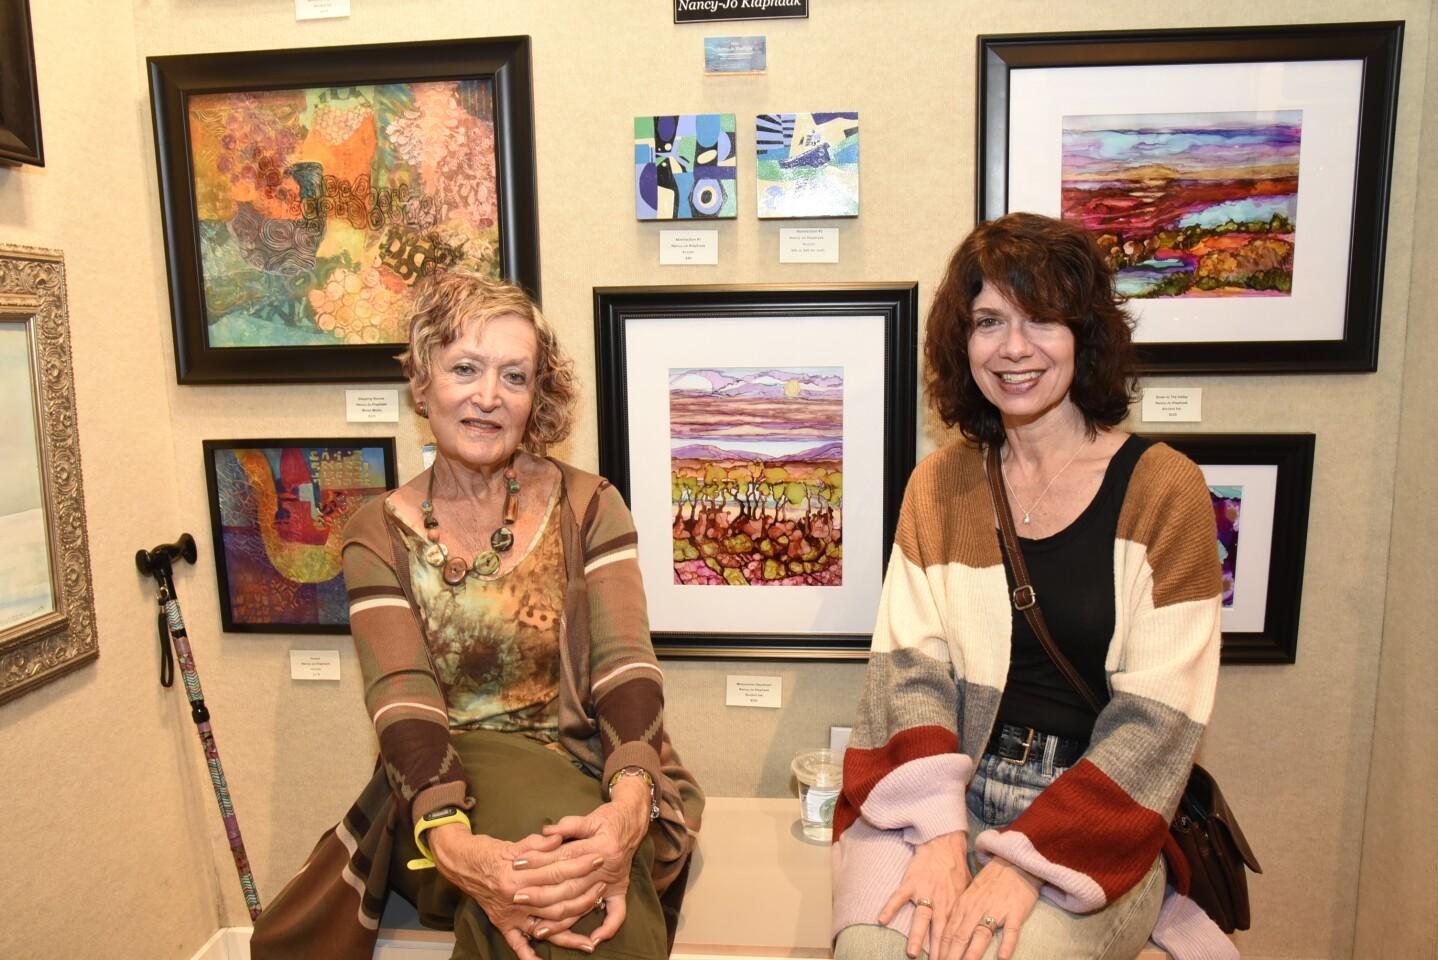 Art admirers Lainie Dubnicoff and Amy Burrows